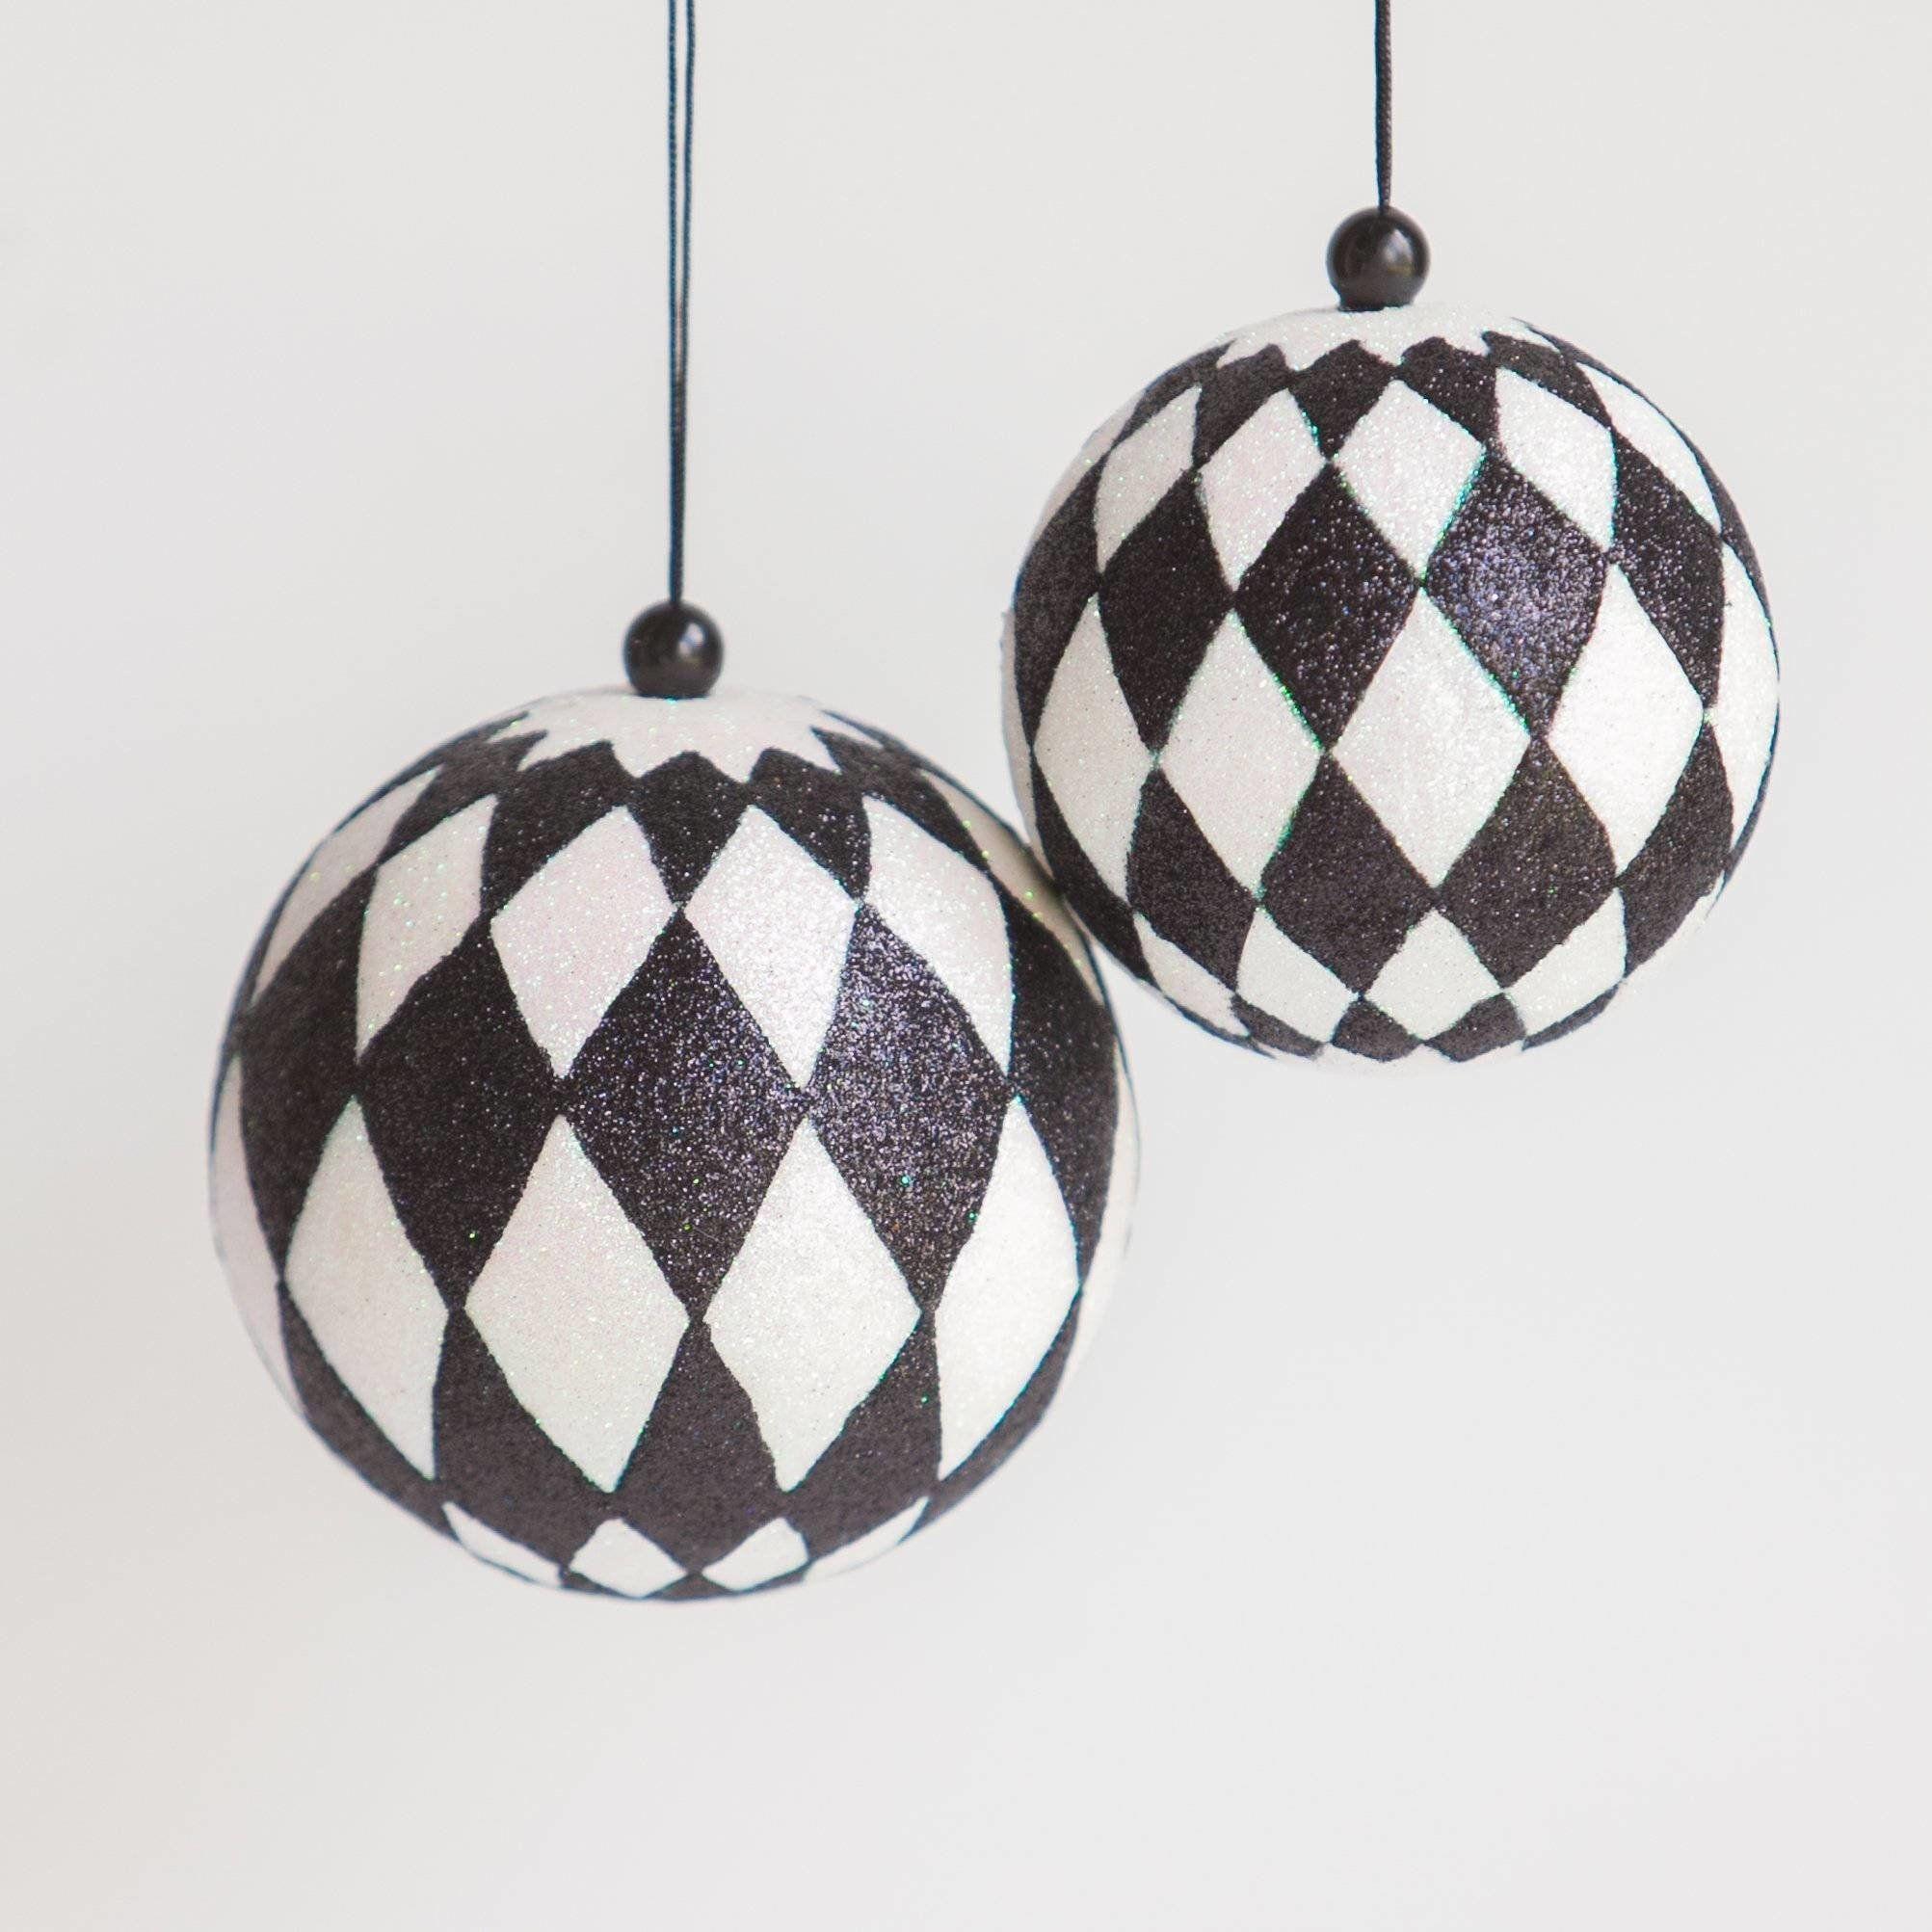 Black And White Shatterproof Christmas Tree Ornament Ball White Christmas Ornaments Black White Christmas Black Christmas Trees